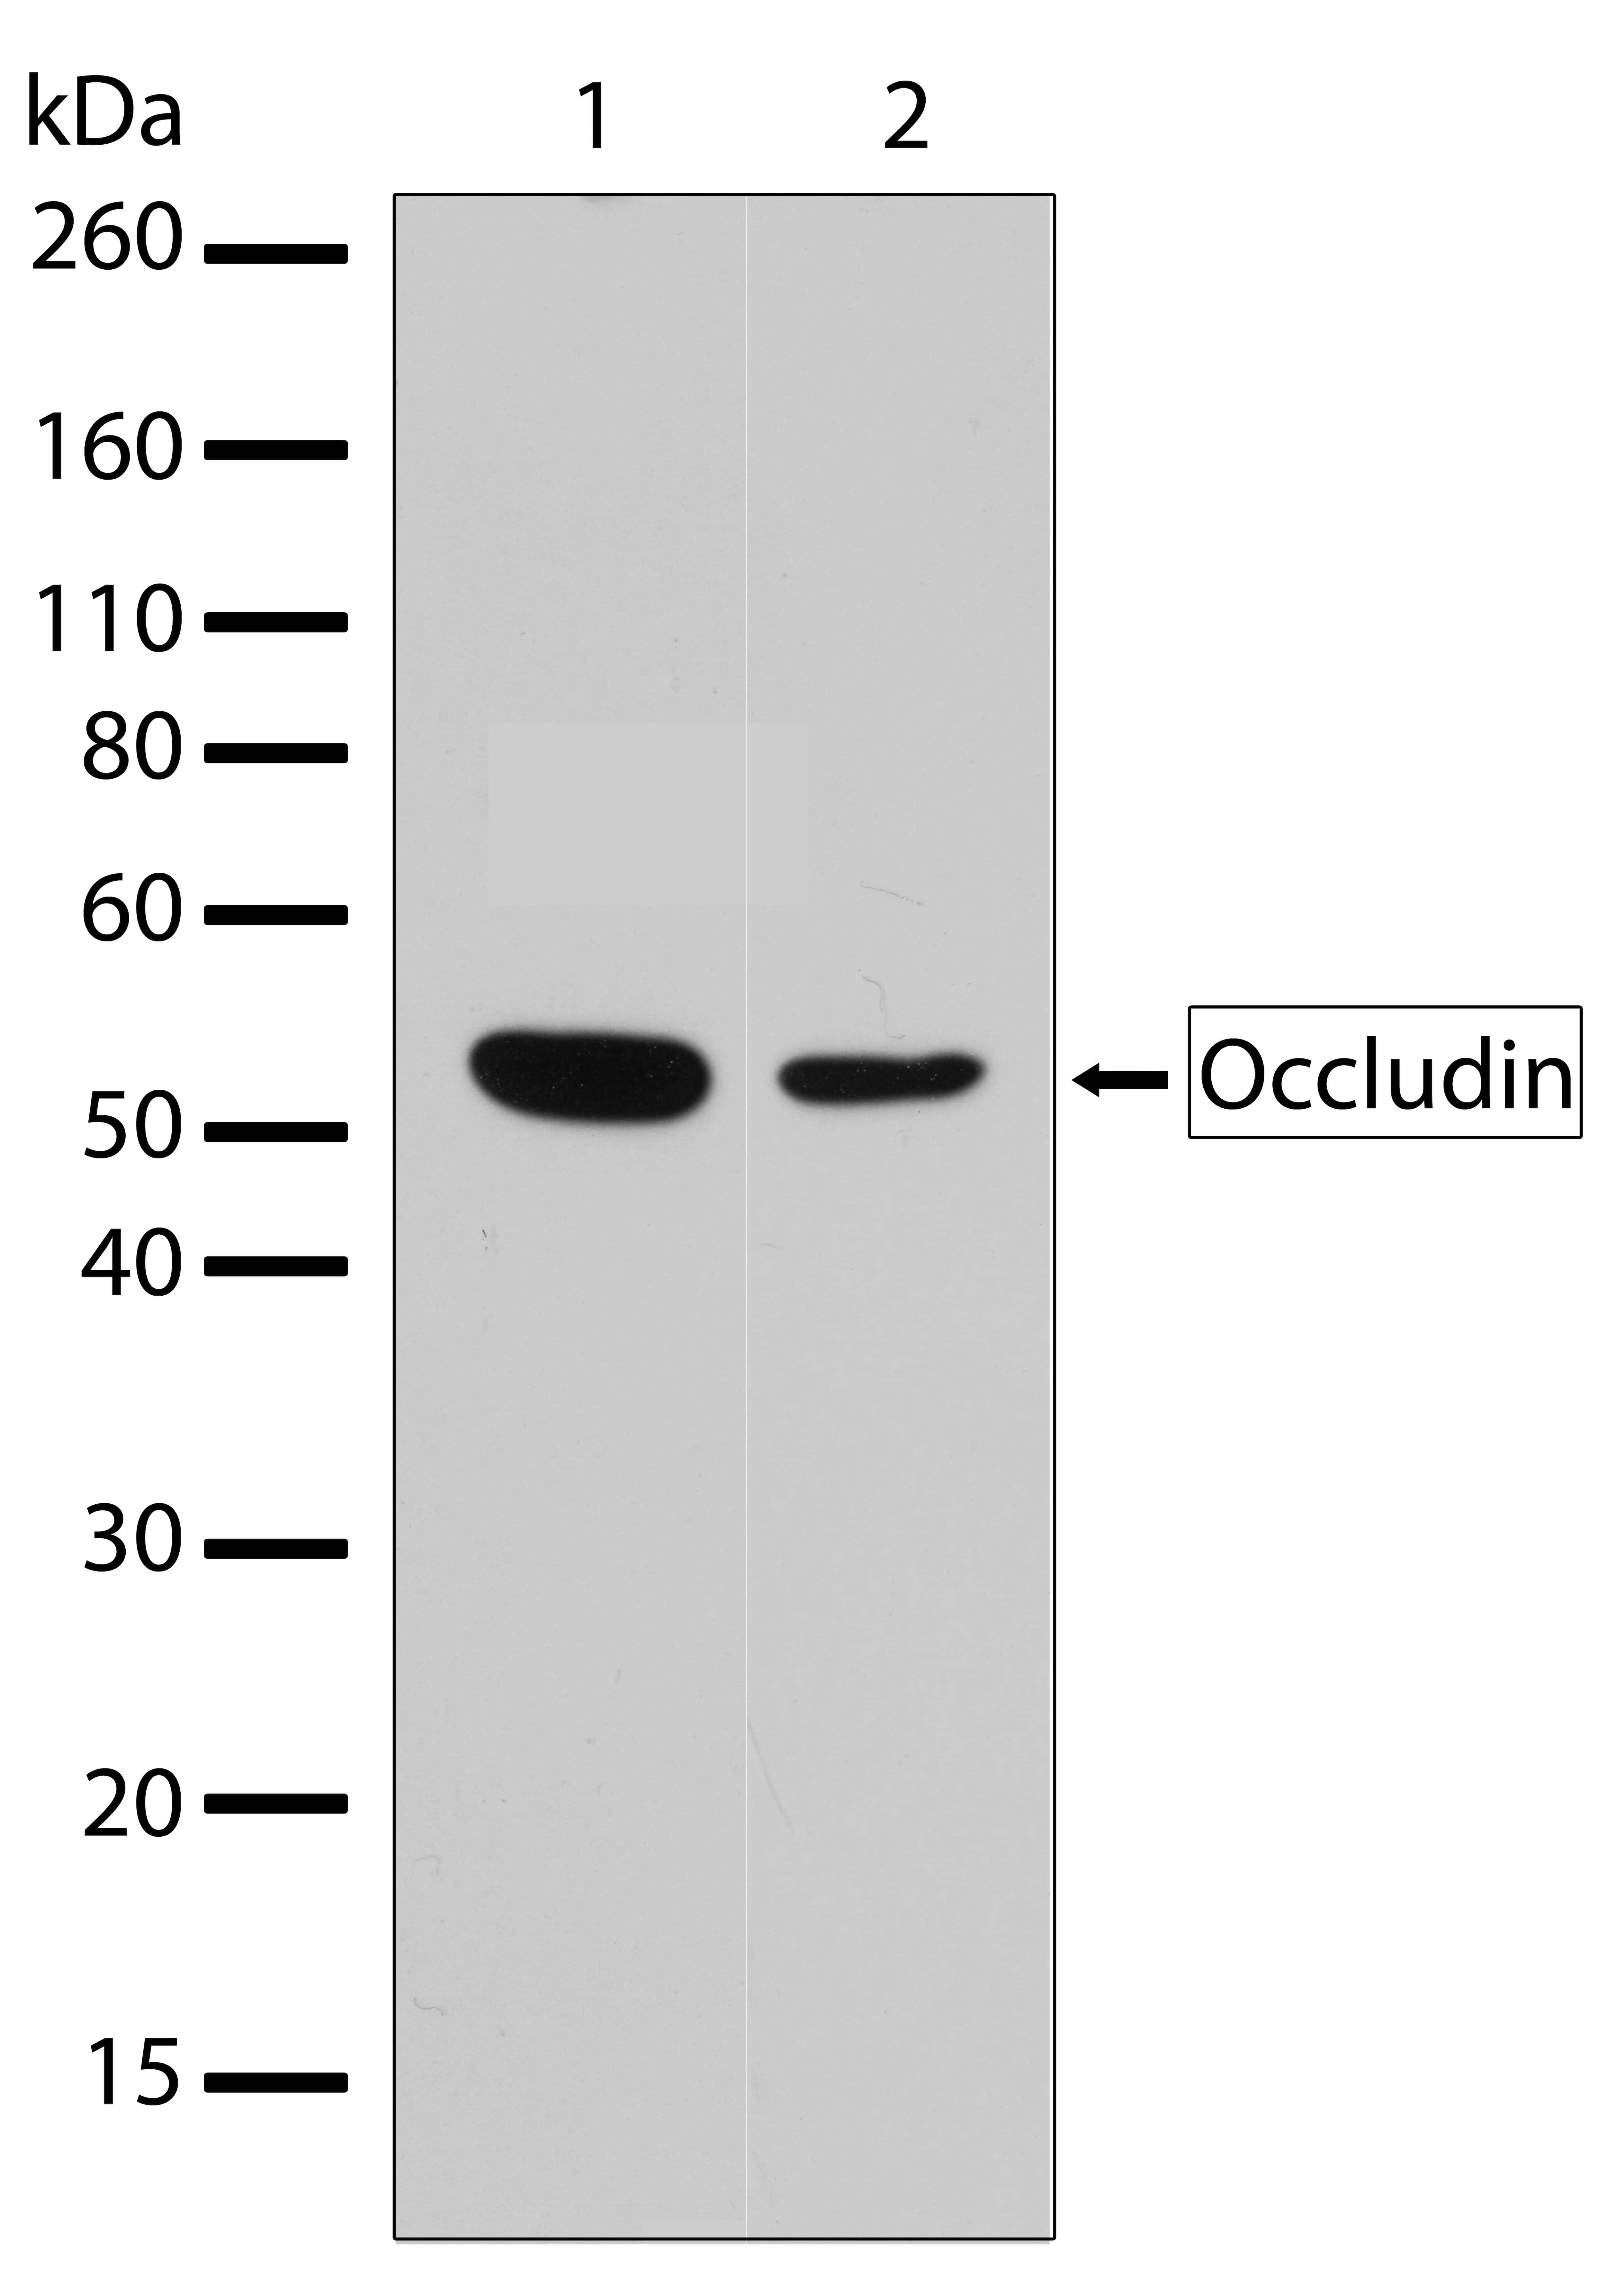 Occludin Antibody Oligoclonal 6hclc